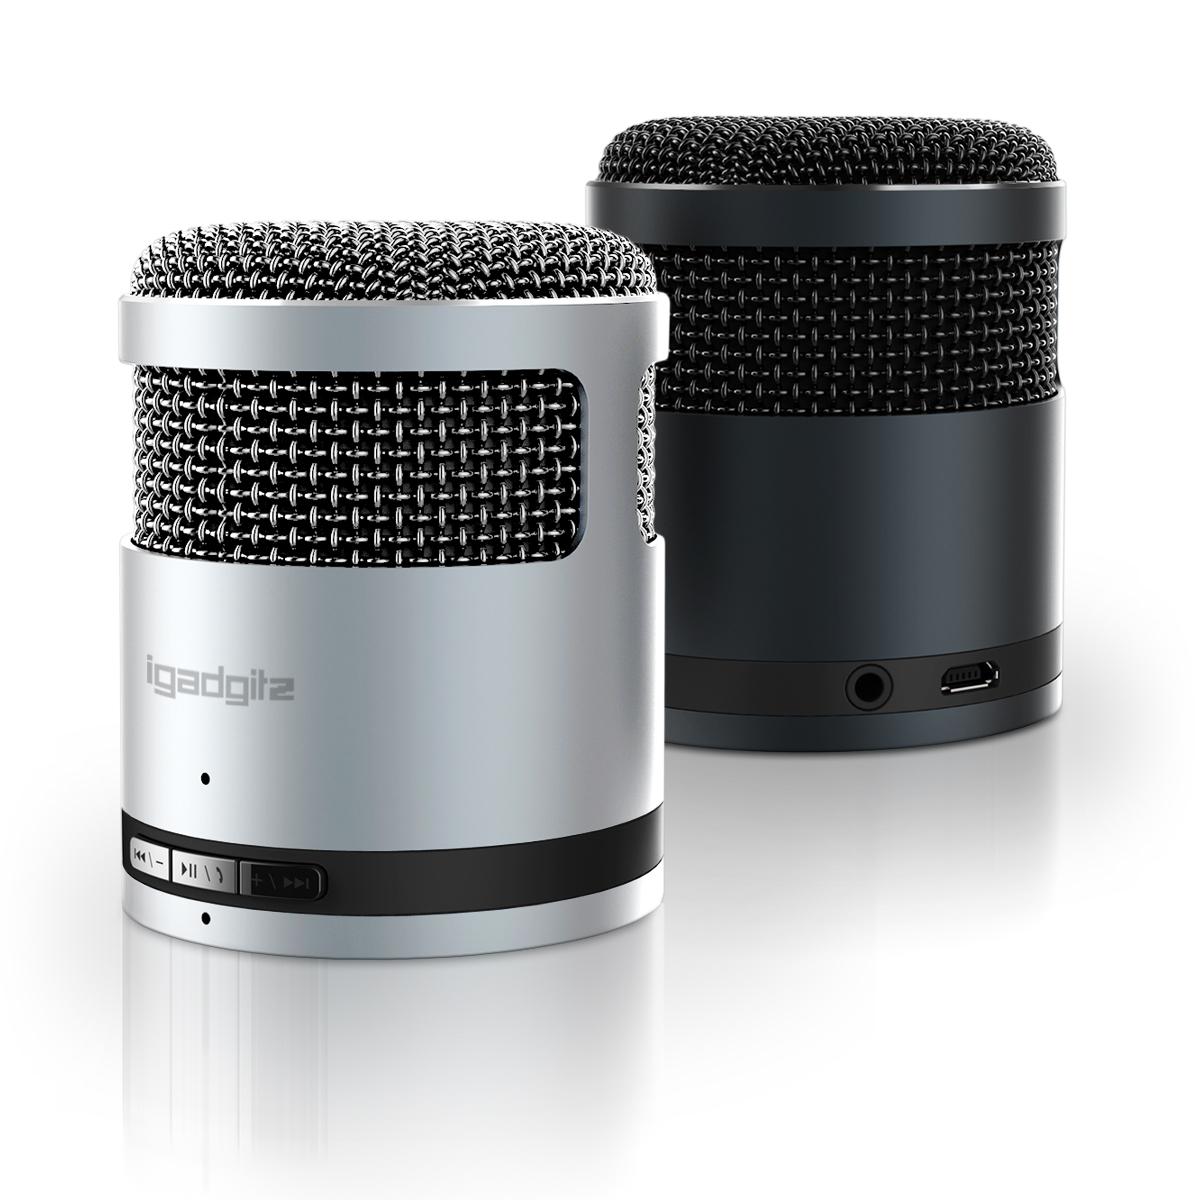 iGadgitz Al Series: 'Mic Idol' Portable Wireless Stereo Bluetooth 3.0 Aluminium Travel Speaker (3W Power with Rich Bass)